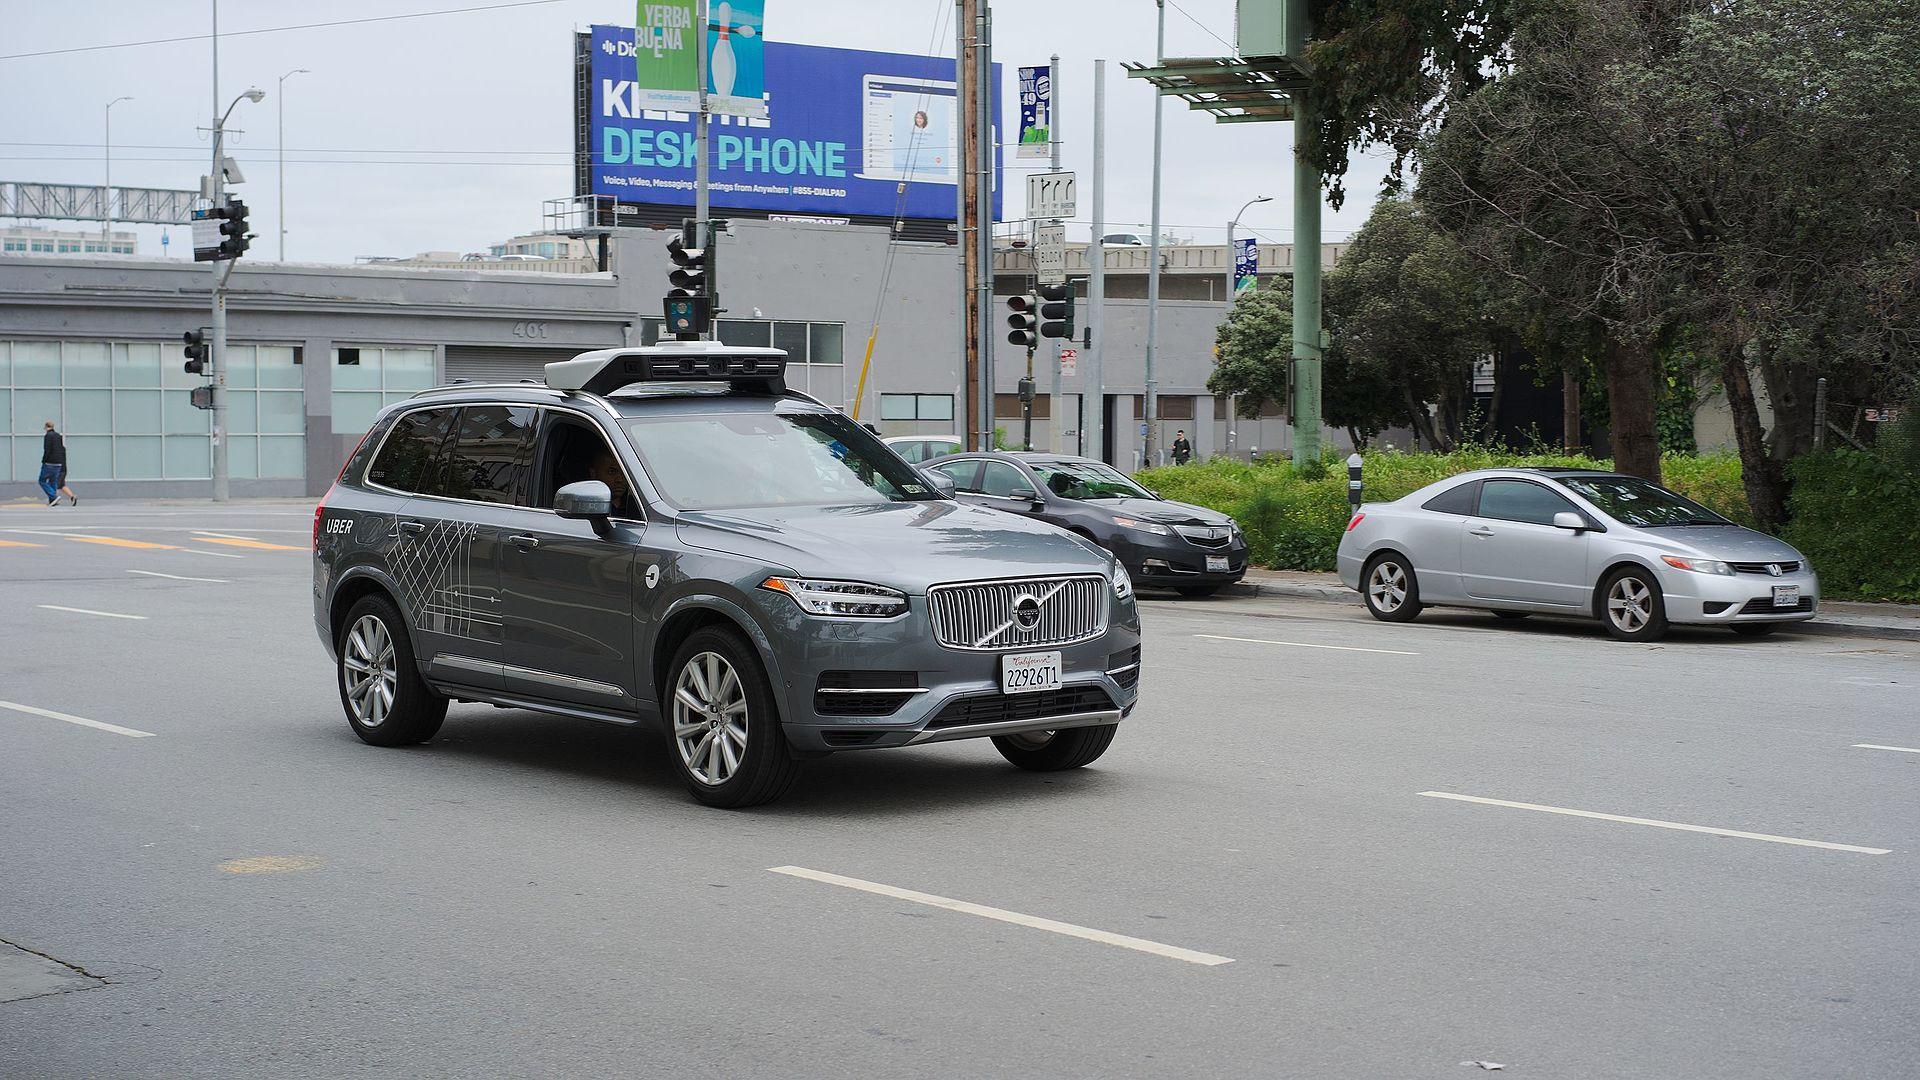 Uber_Self_Driving_Volvo_at_Harrison_at_4th.jpg